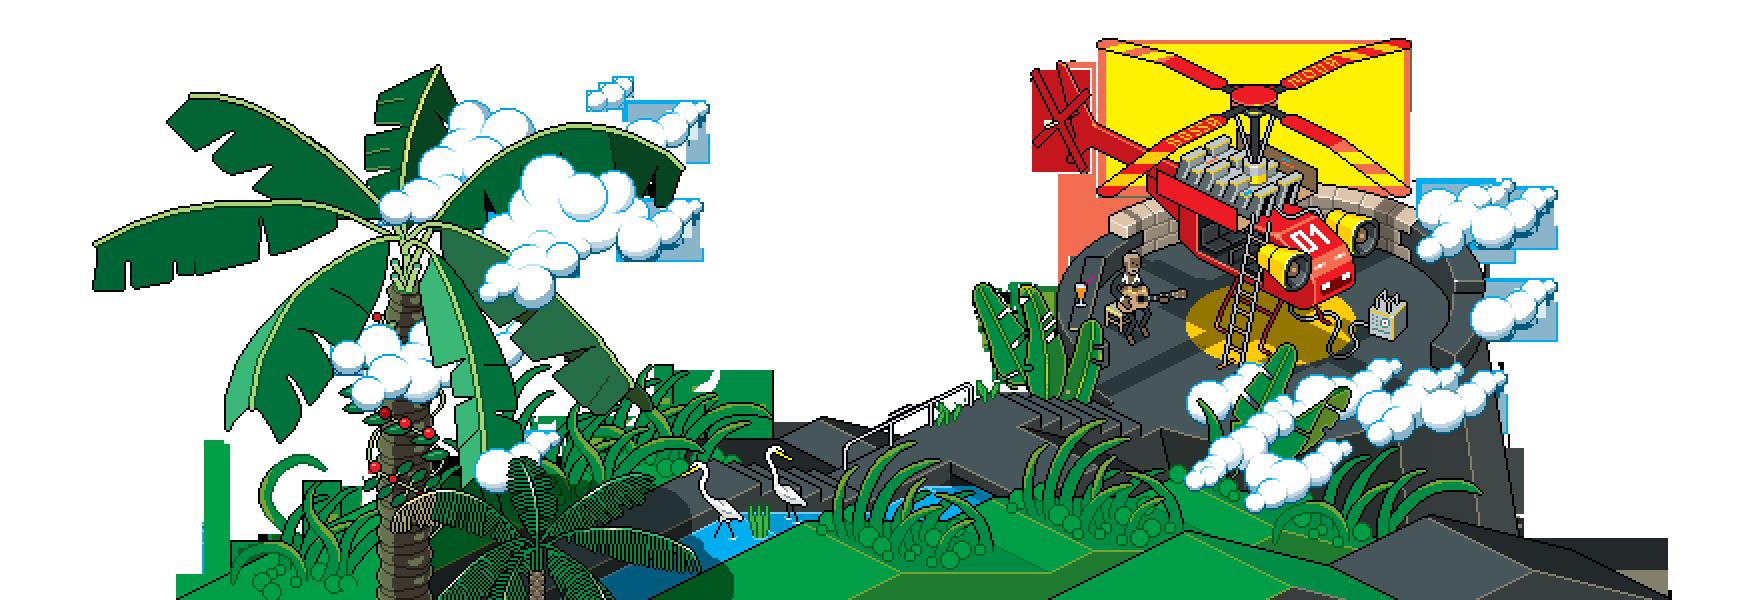 PT Rio Helicopterhill 18k 2x retina by eBoy